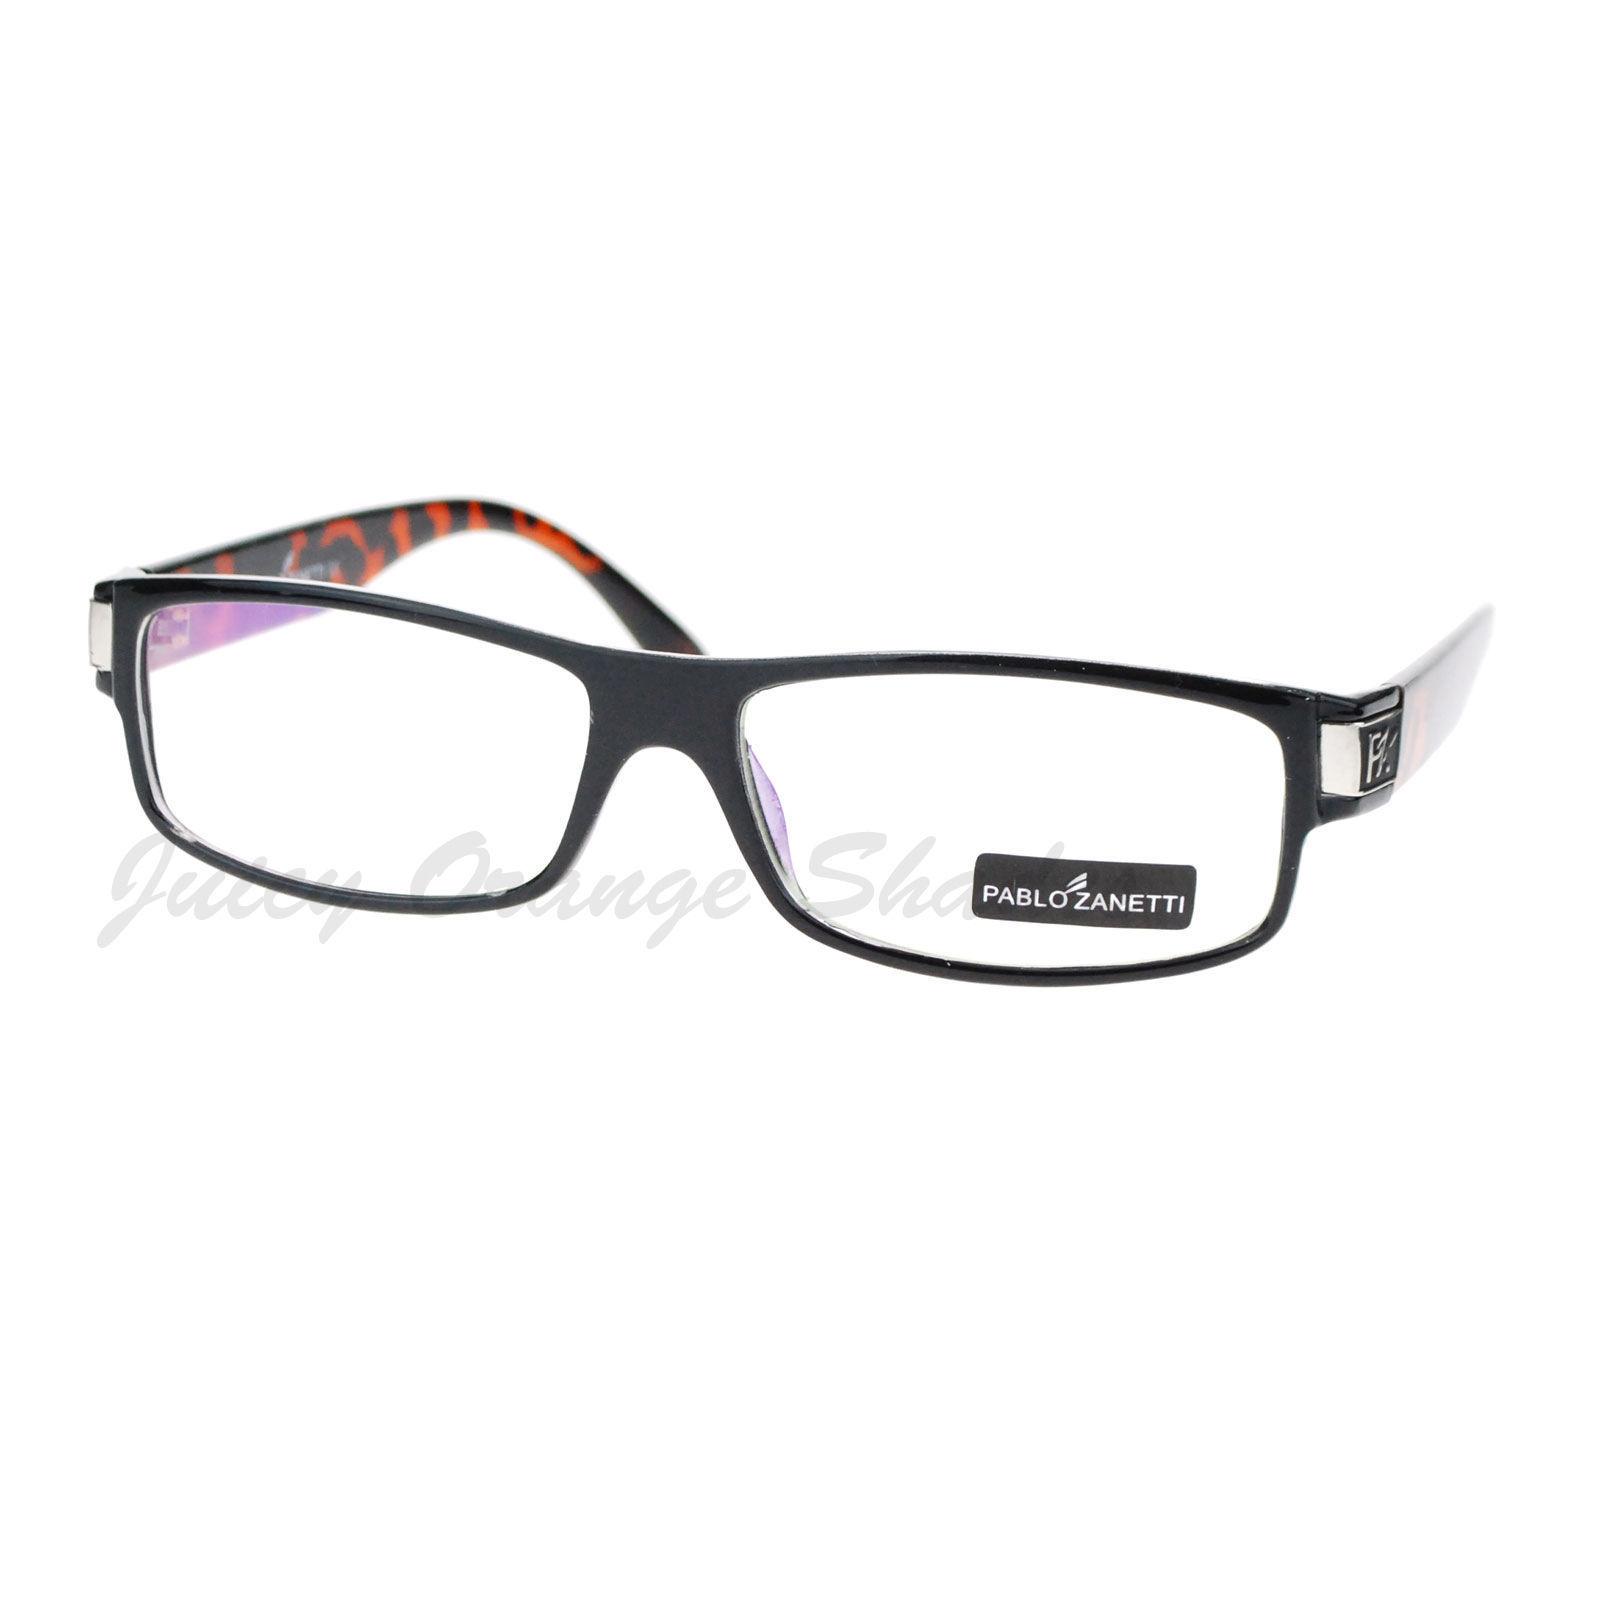 Pablo Zanetti Mirrored Clear Lens Glasses Rectangle Frame 57-18-131